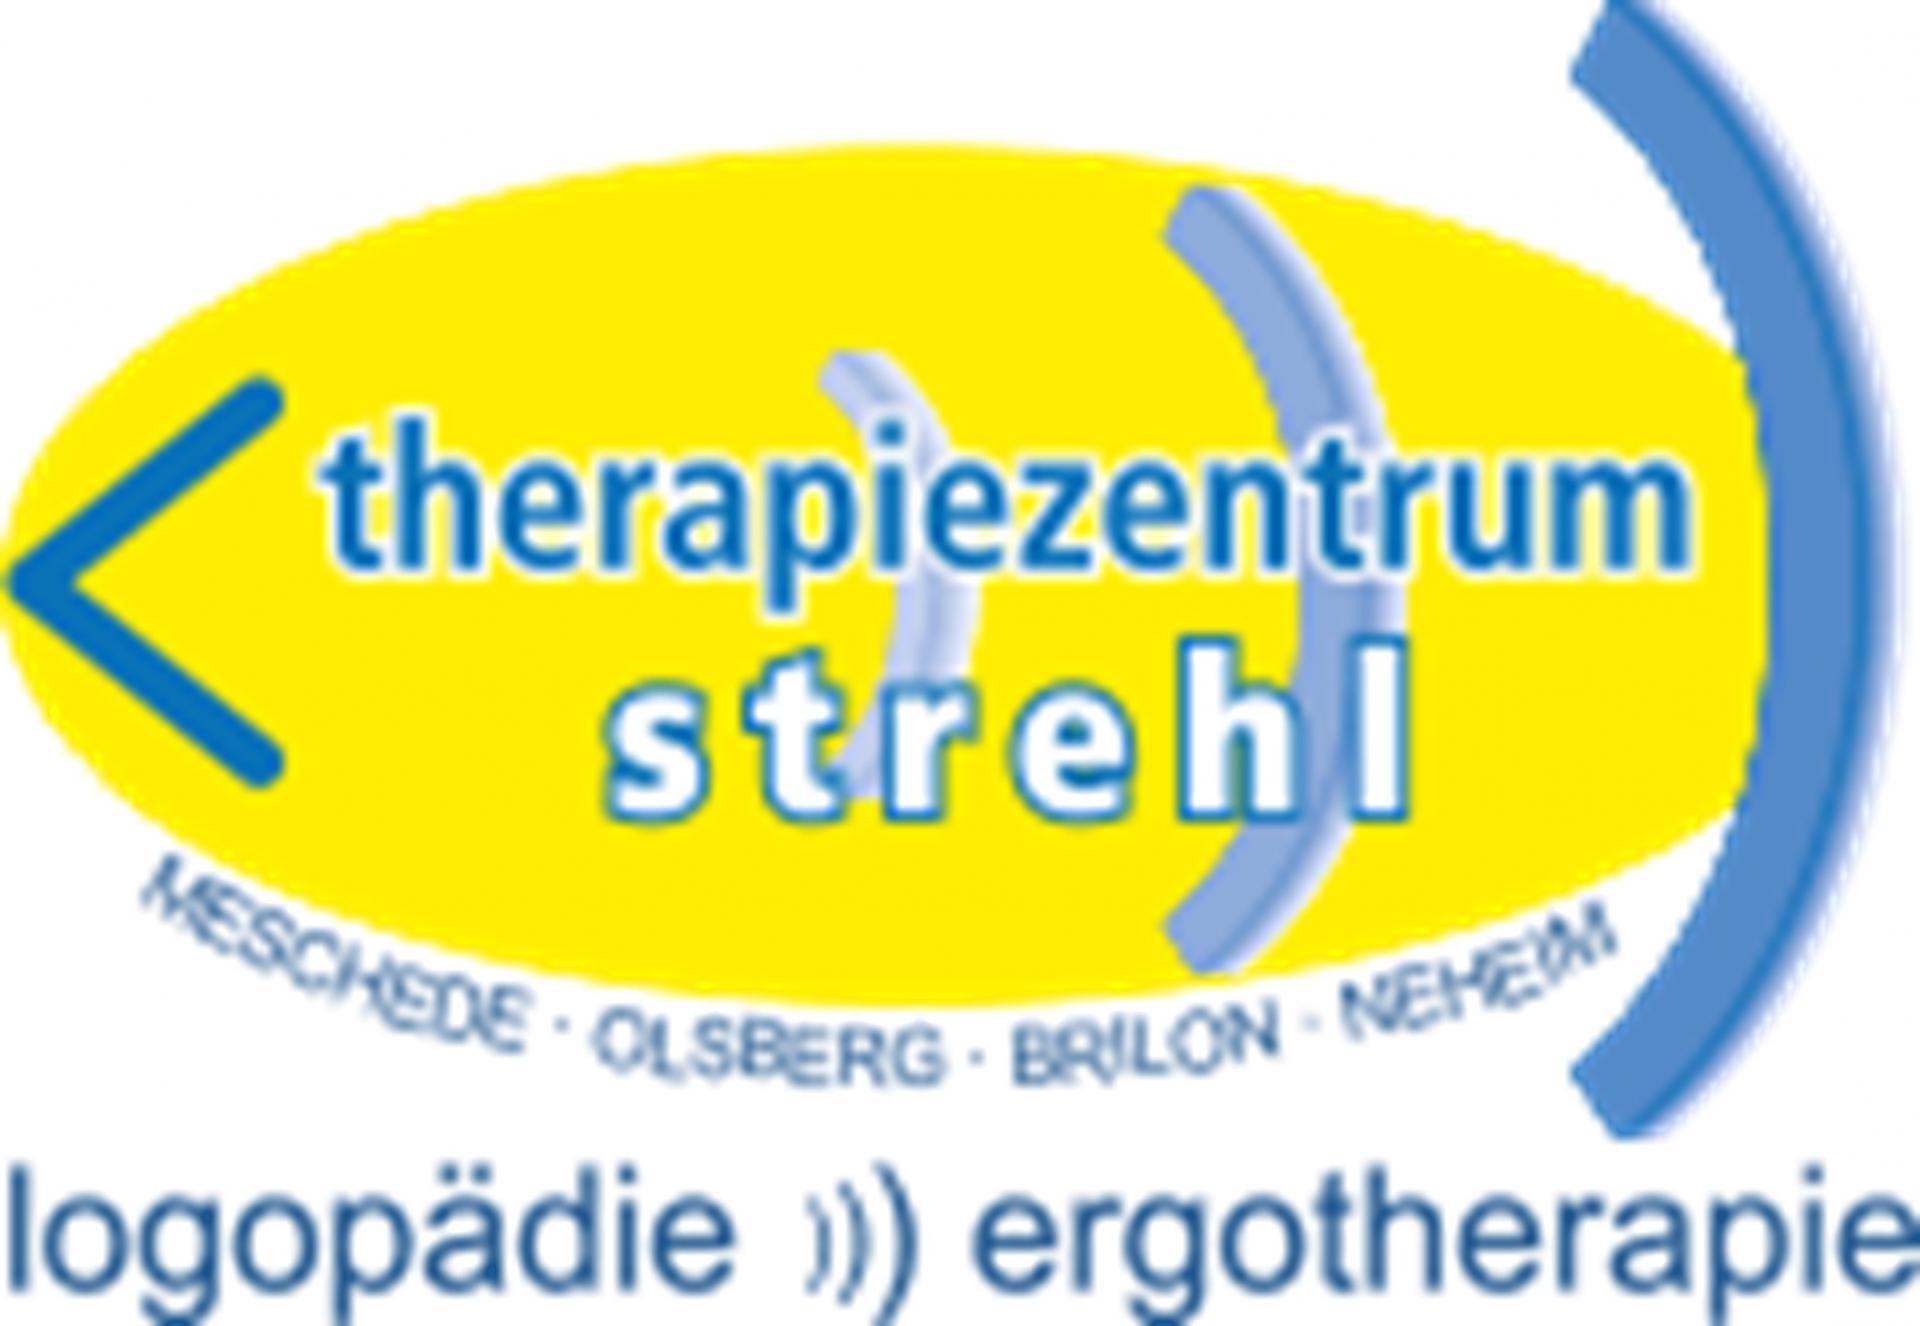 Therapiezentrum Strehl